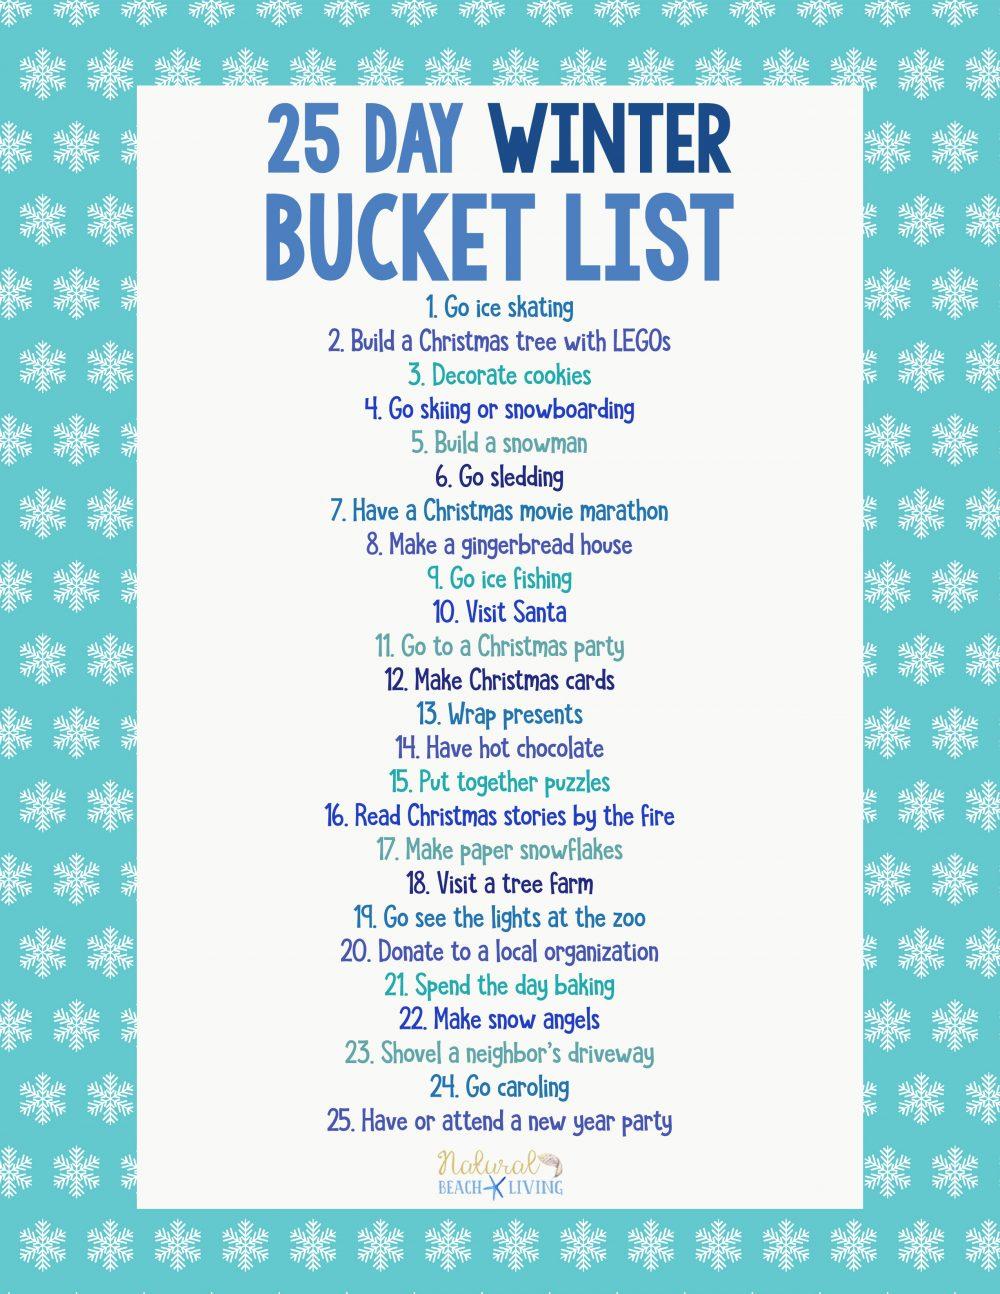 25 Winter Bucket List Ideas For Family Fun Natural Beach